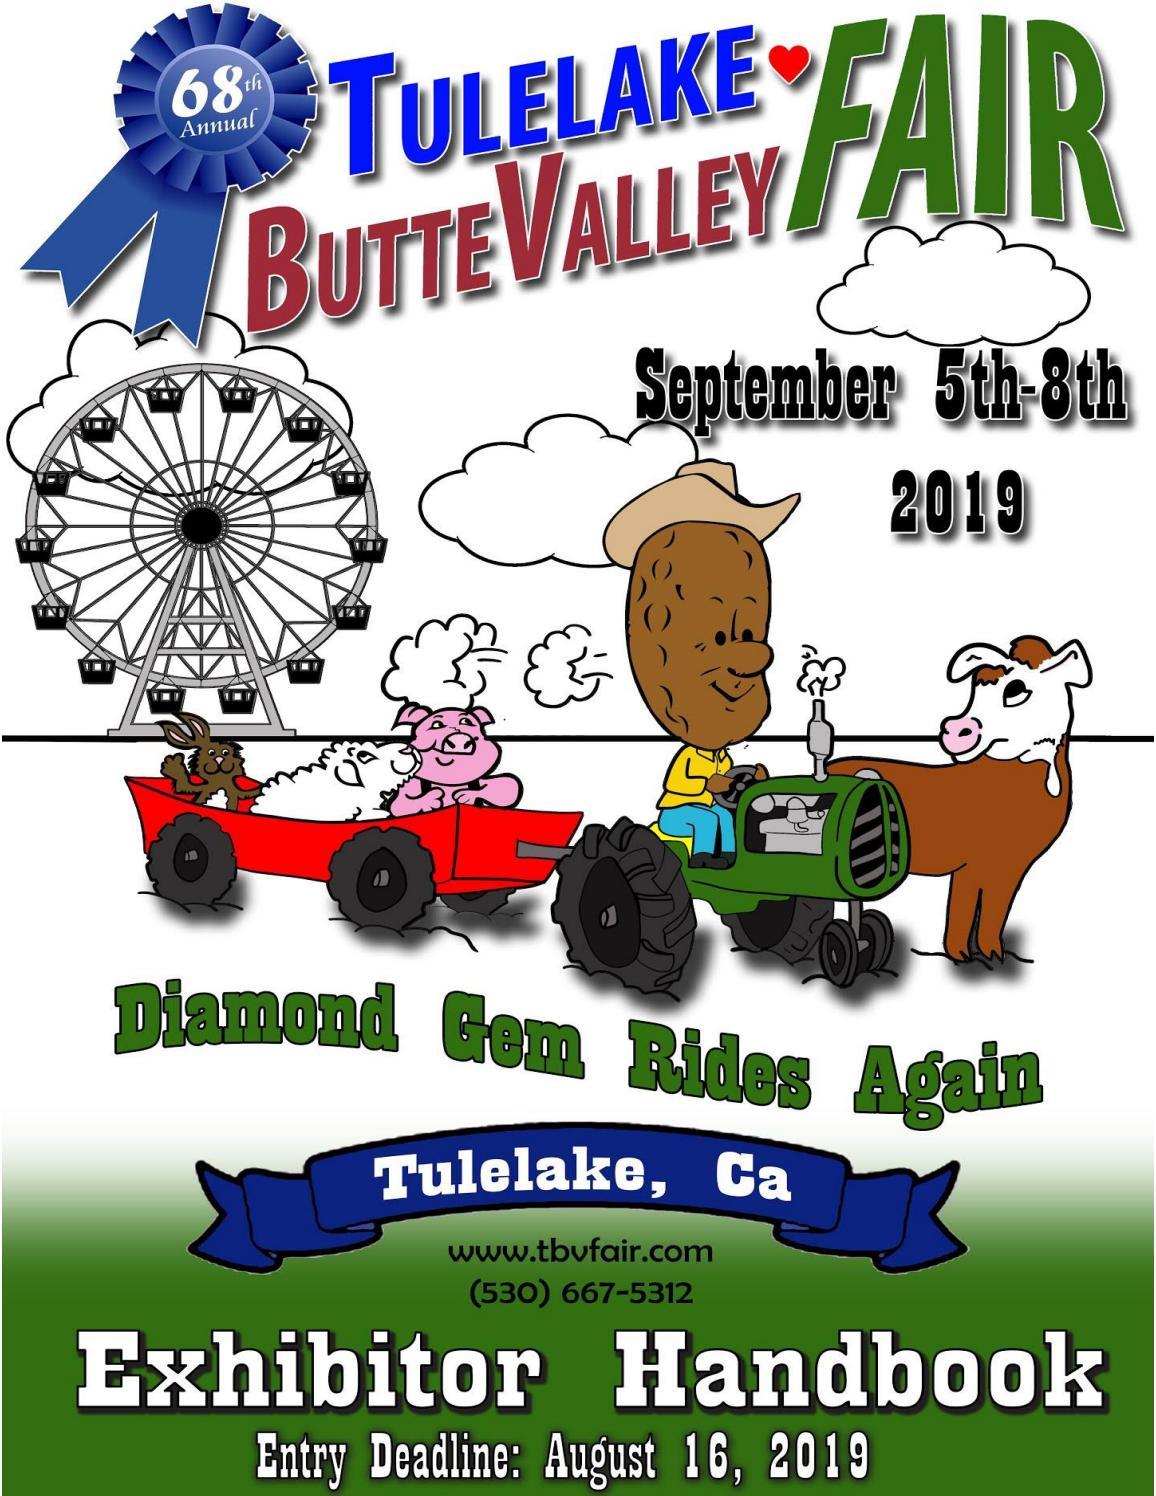 2019 Tulelake-Butte Valley Fair Exhibitor Handbook by EDJE - issuu